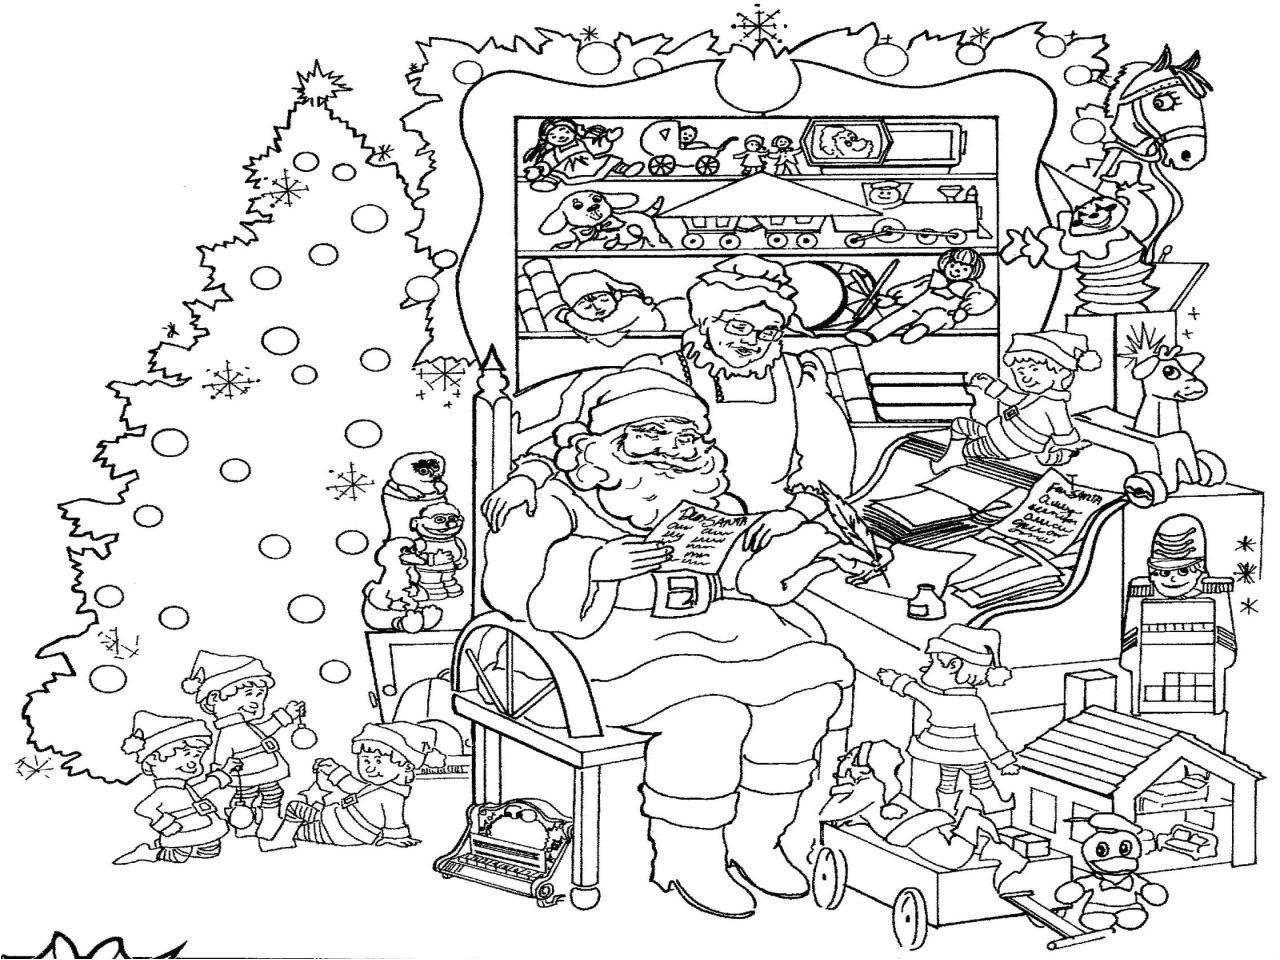 Grand Coloriage De Noel A Imprimer 15 Coloriage De Noel encequiconcerne Creche A Imprimer